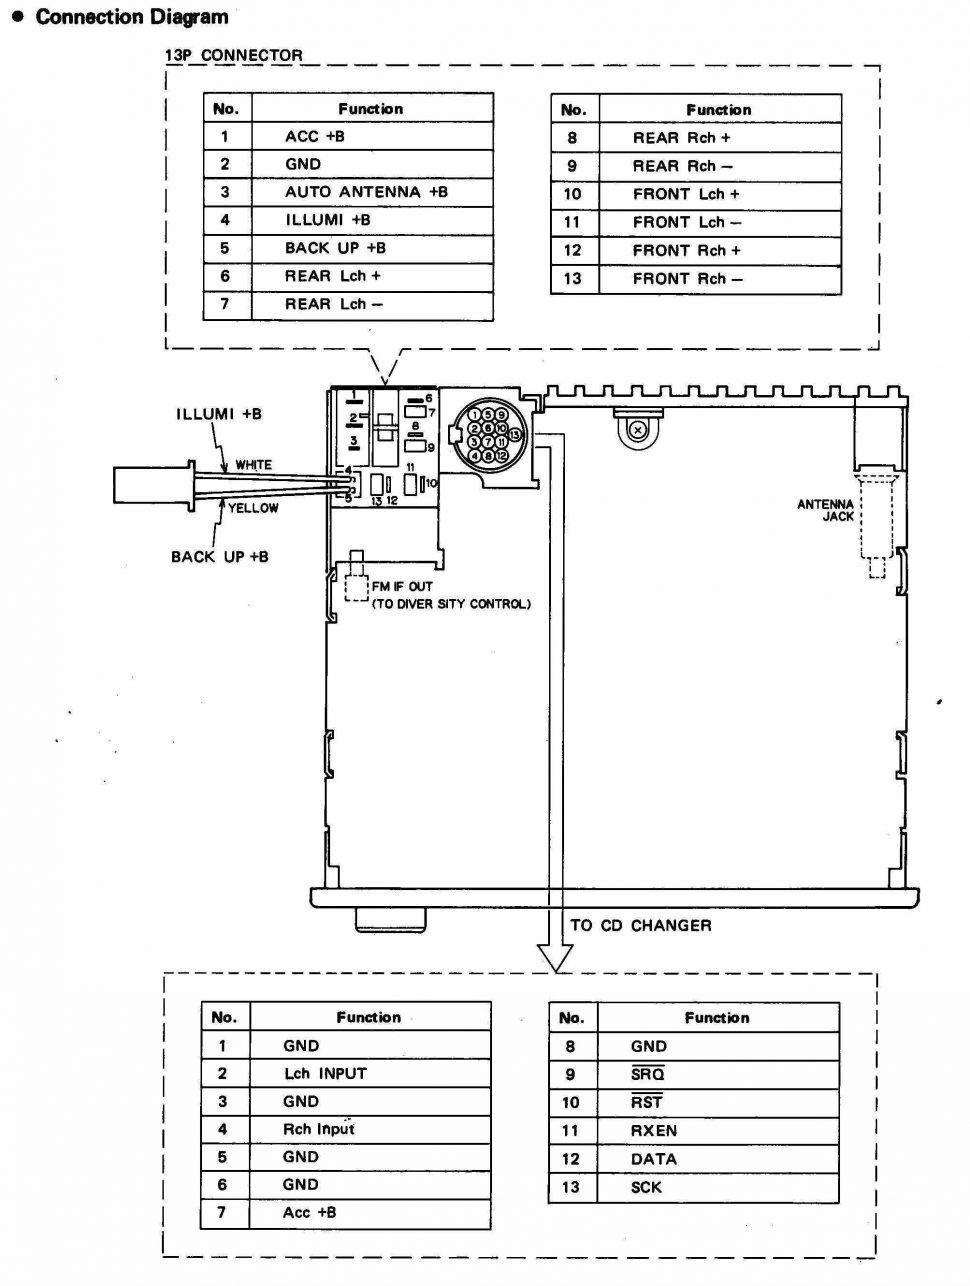 Sony Cdx Gt320 Wiring Diagram   Online Wiring Diagram Sony Cdx Wiring Diagram on sony cdx gt09 wiring-diagram, sony cdx c410 wiring-diagram, sony cdx gt56ui wiring-diagram, sony cdx gt350mp wiring-diagram, sony cdx gt260mp installation manual, sony cdx gt710 wiring-diagram, sony cdx gt wiring-diagram, sony cdx gt320 wiring-diagram, sony cdx m630 parts, sony cdx fw570 wiring-diagram, sony cdx gt06 wiring-diagram, sony cdx gt120 wiring-diagram, sony cdx gt32w, sony cdx m630 wiring-diagram, sony cdx gt565up cd receiver, sony cdx m30 wiring-diagram, sony cdx gt240 wiring-diagram, sony cdx gt330 wiring-diagram, sony cdx 4250 wiring-diagram, sony cdx gt250mp manual,